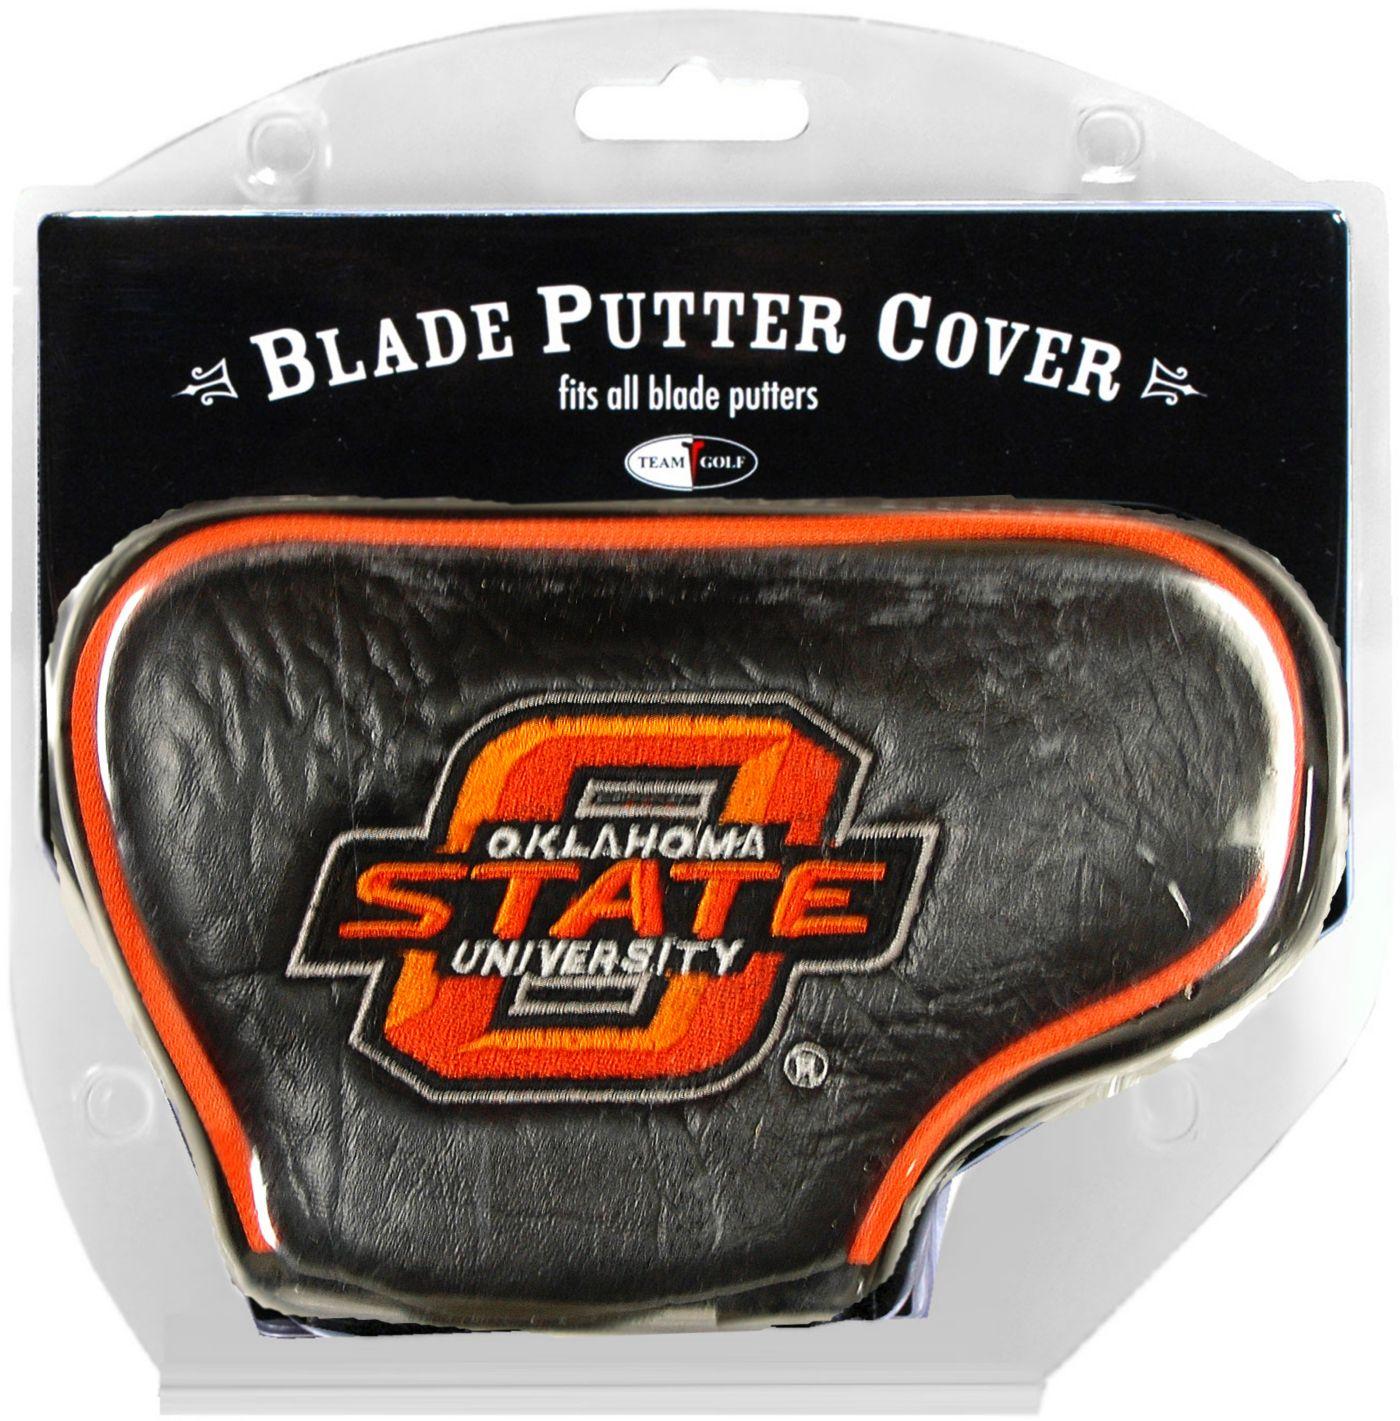 Team Golf Blade Putter Cover